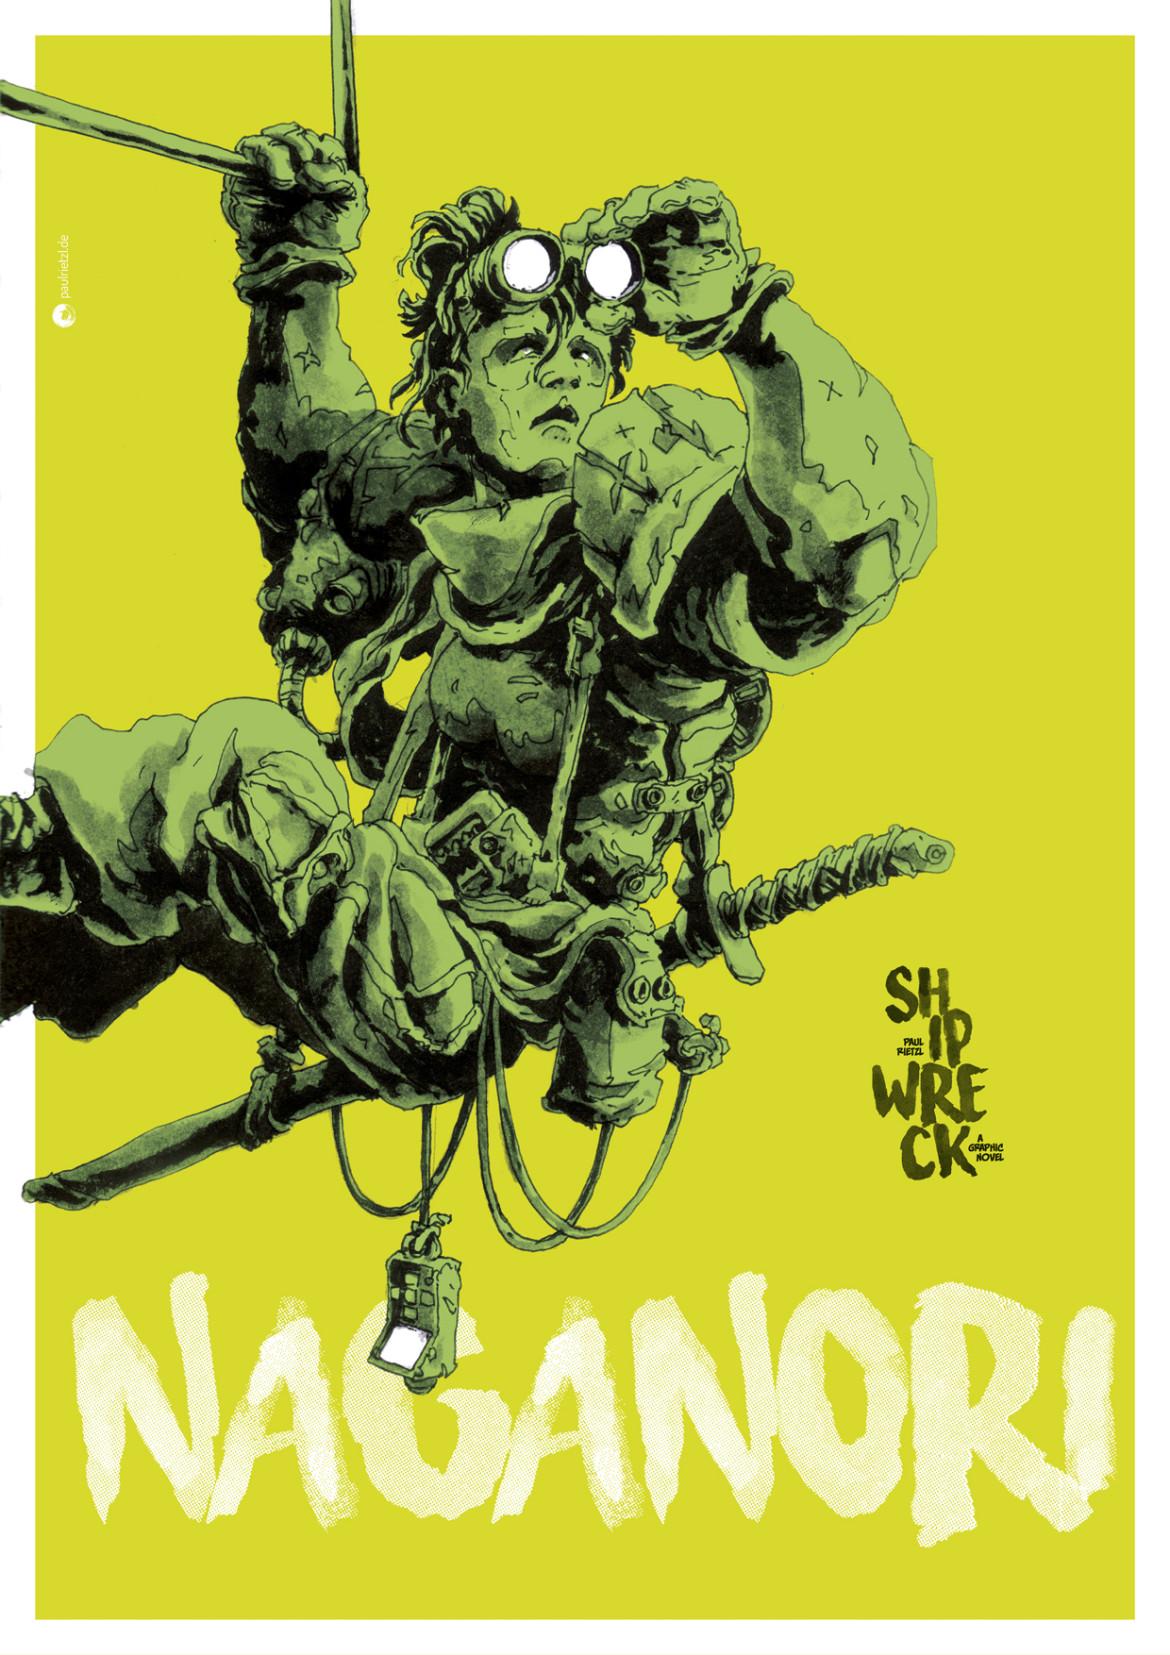 shipwreck_naganori_rz_promo